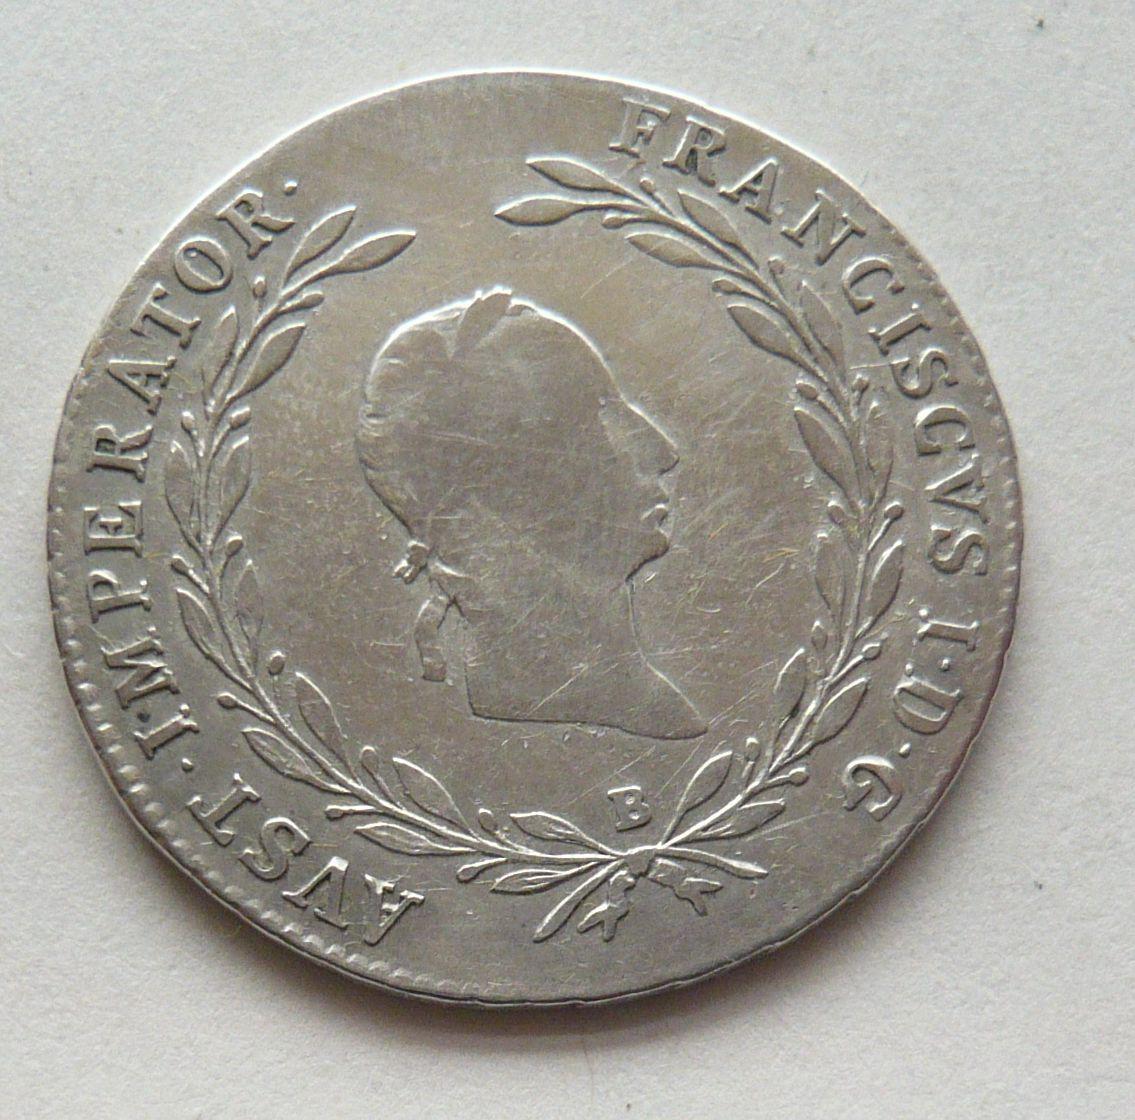 Uhry 20 Krejcar znak 1826 B František II.